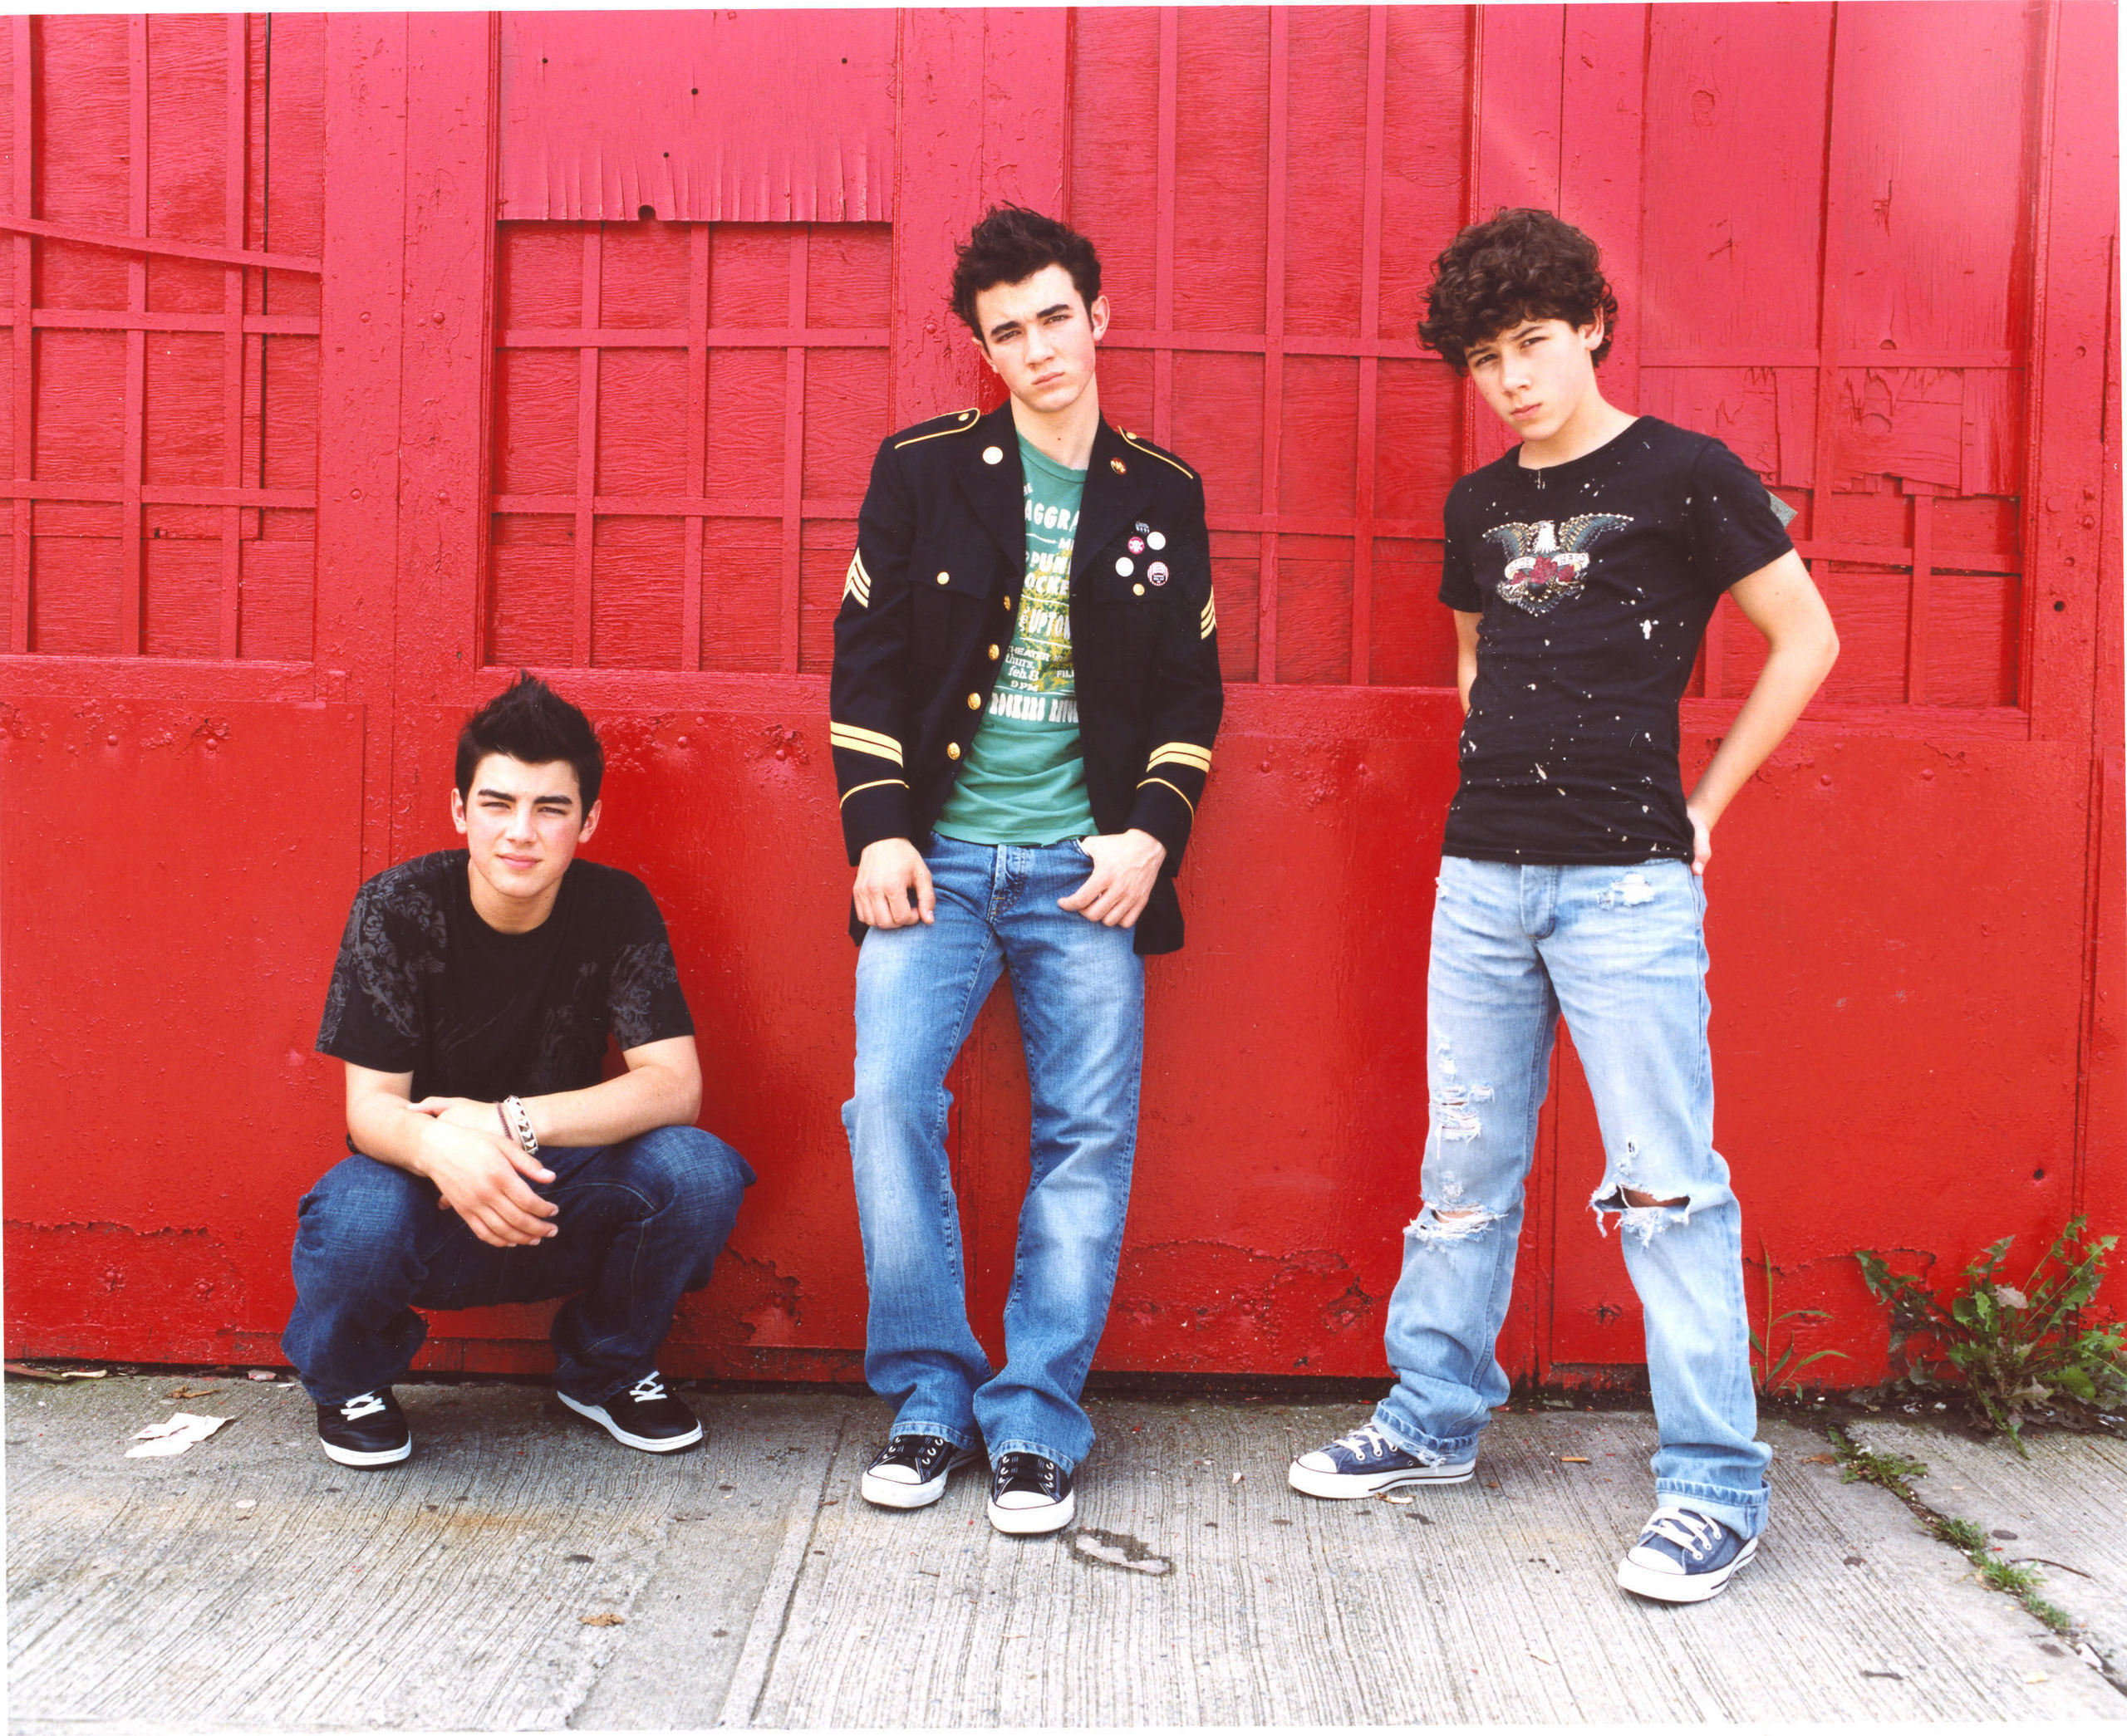 nick jonas brothers wallpaper